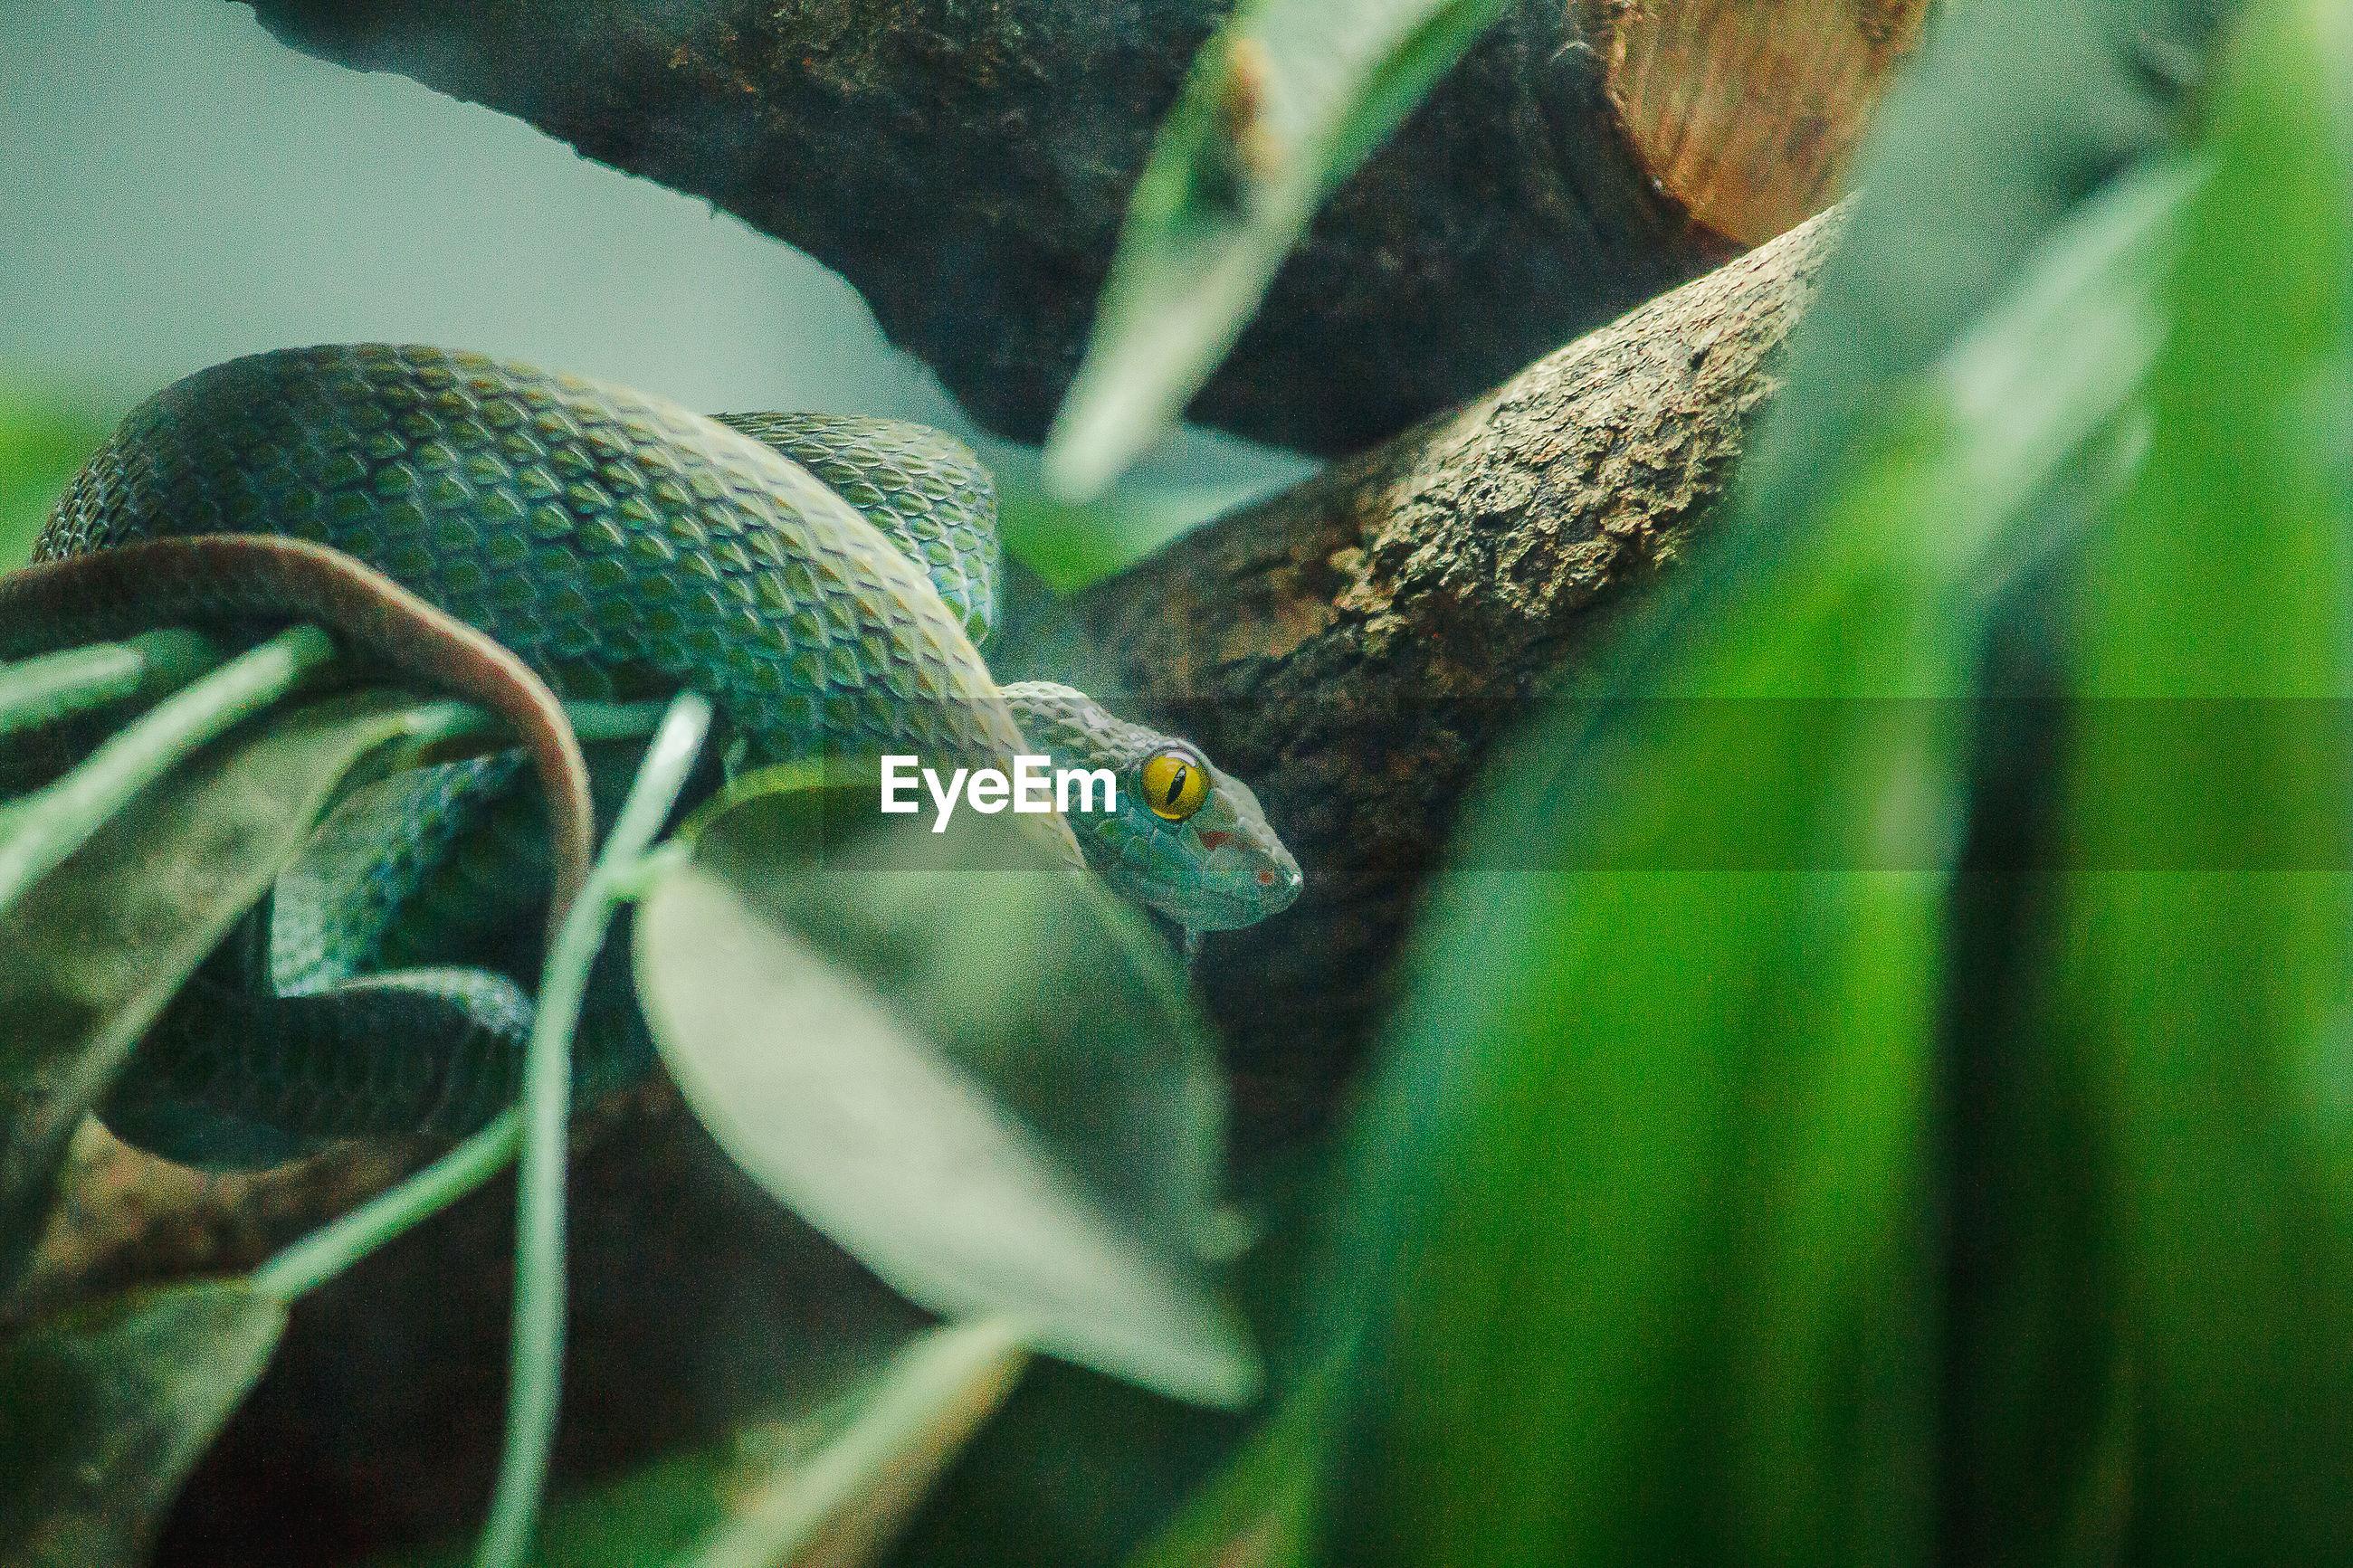 Corn snake is a popular snake.